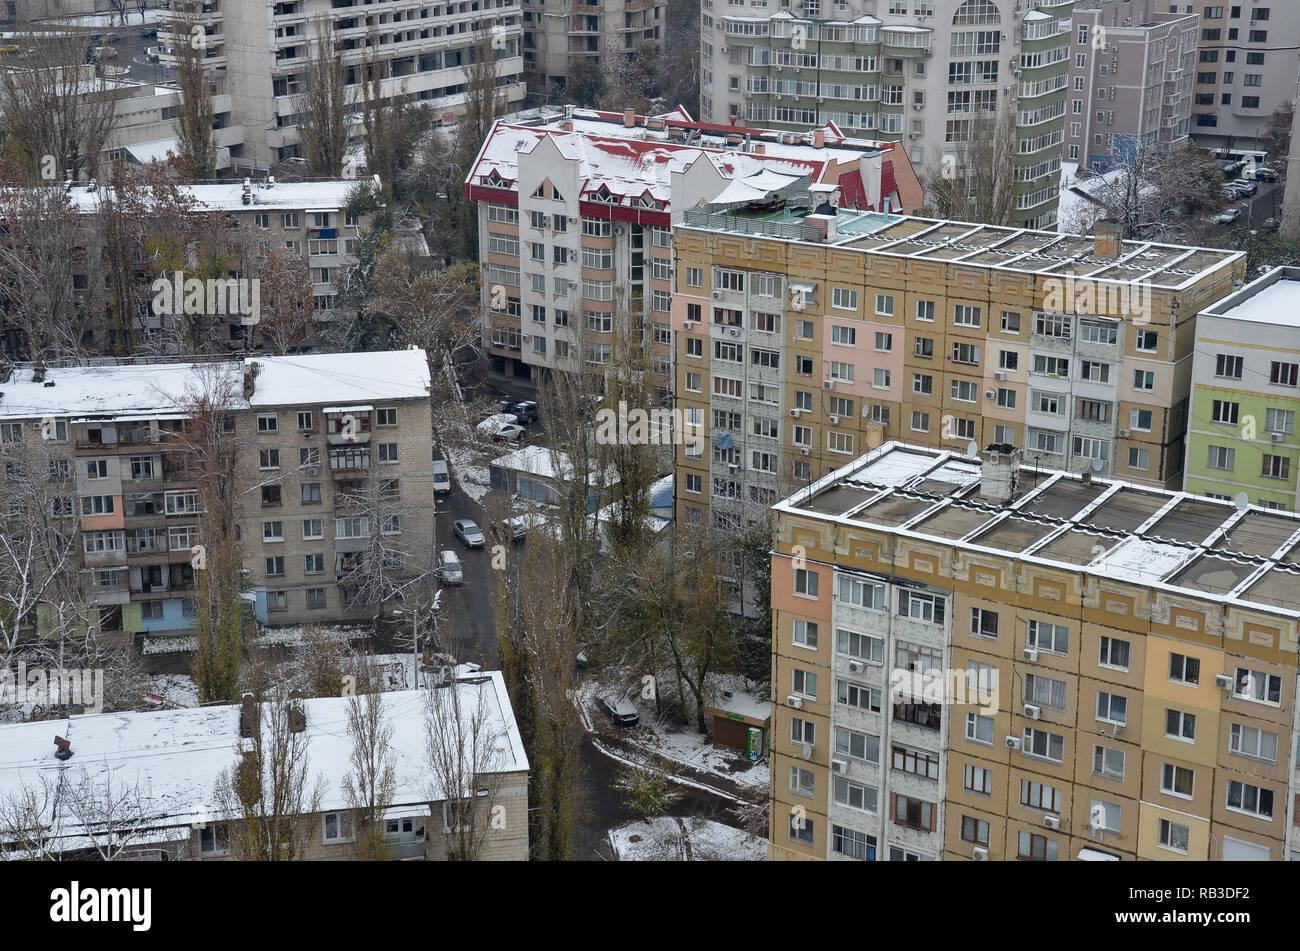 view-of-residential-buildings-from-the-hotel-cosmos-chisinau-kishinev-republic-of-moldova-november-2018-RB3DF2.jpg